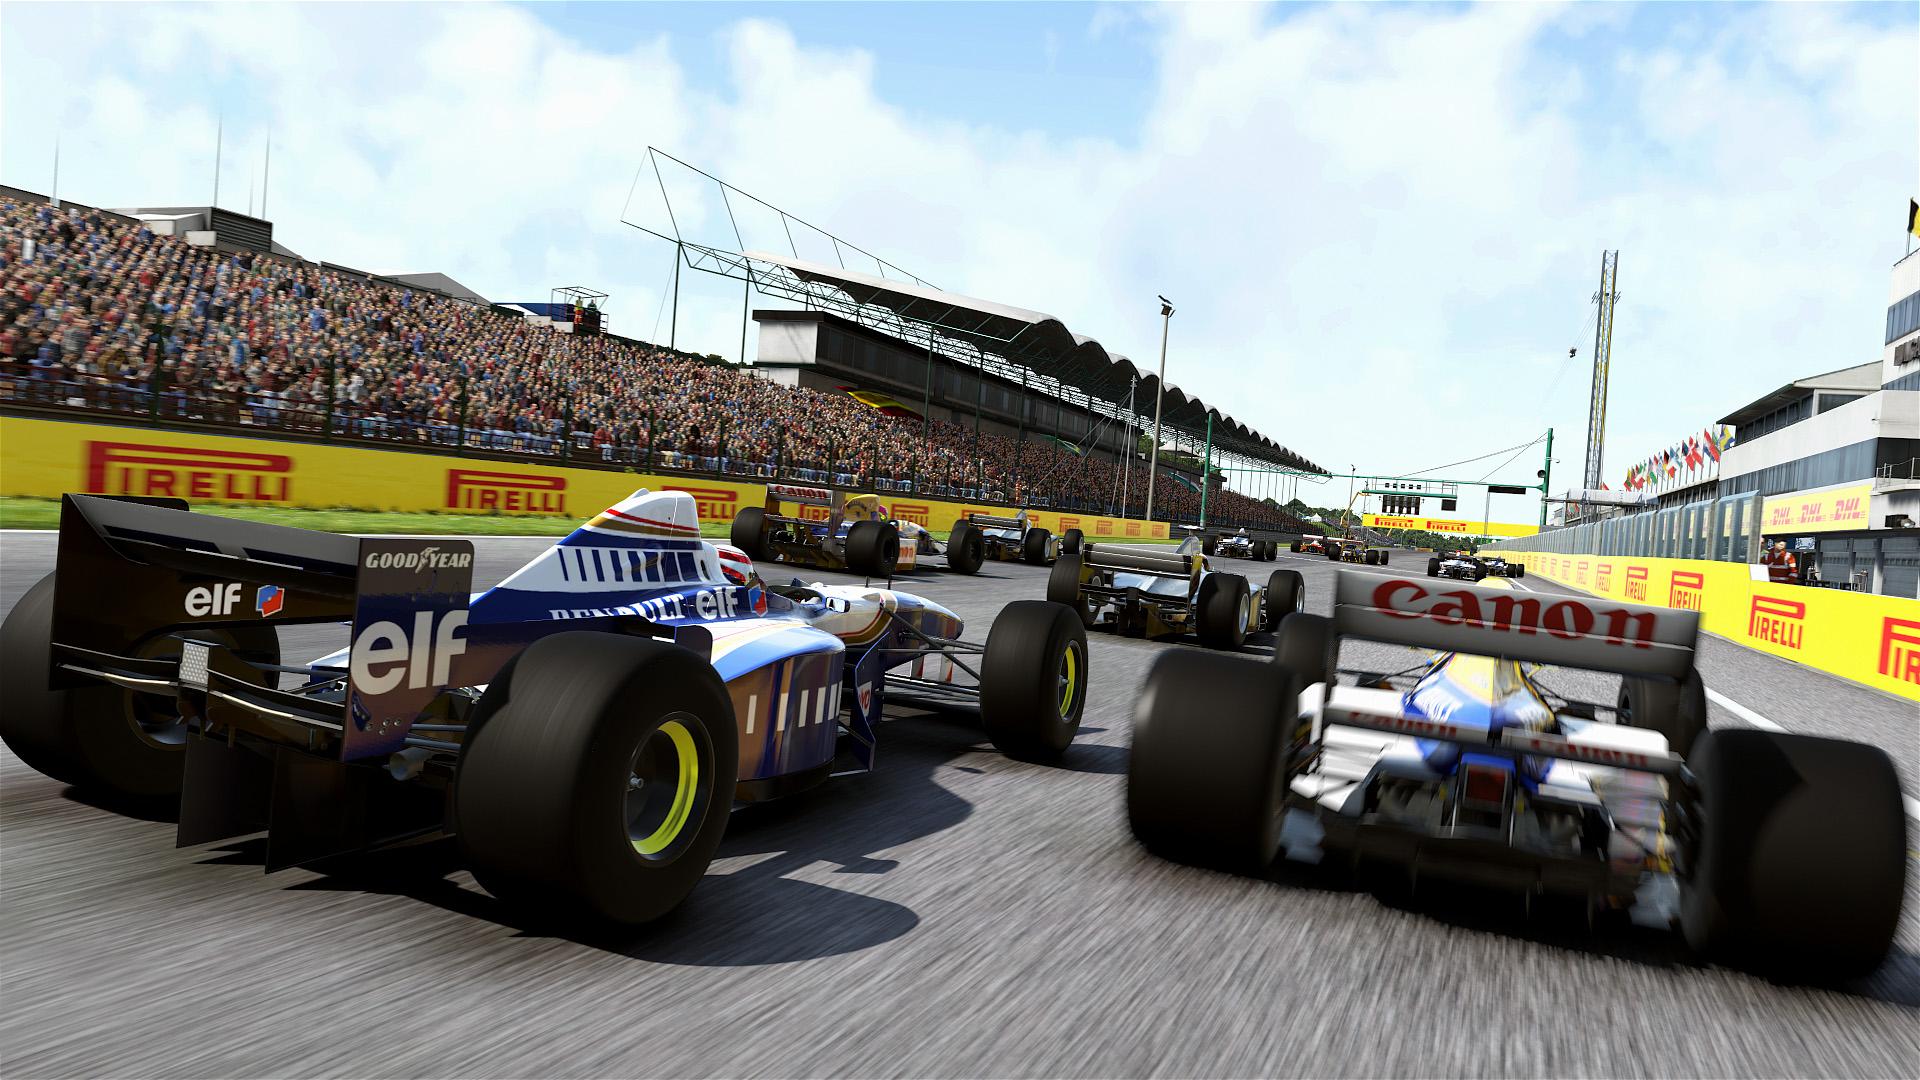 Save 50% on F1™ 2017 on Steam